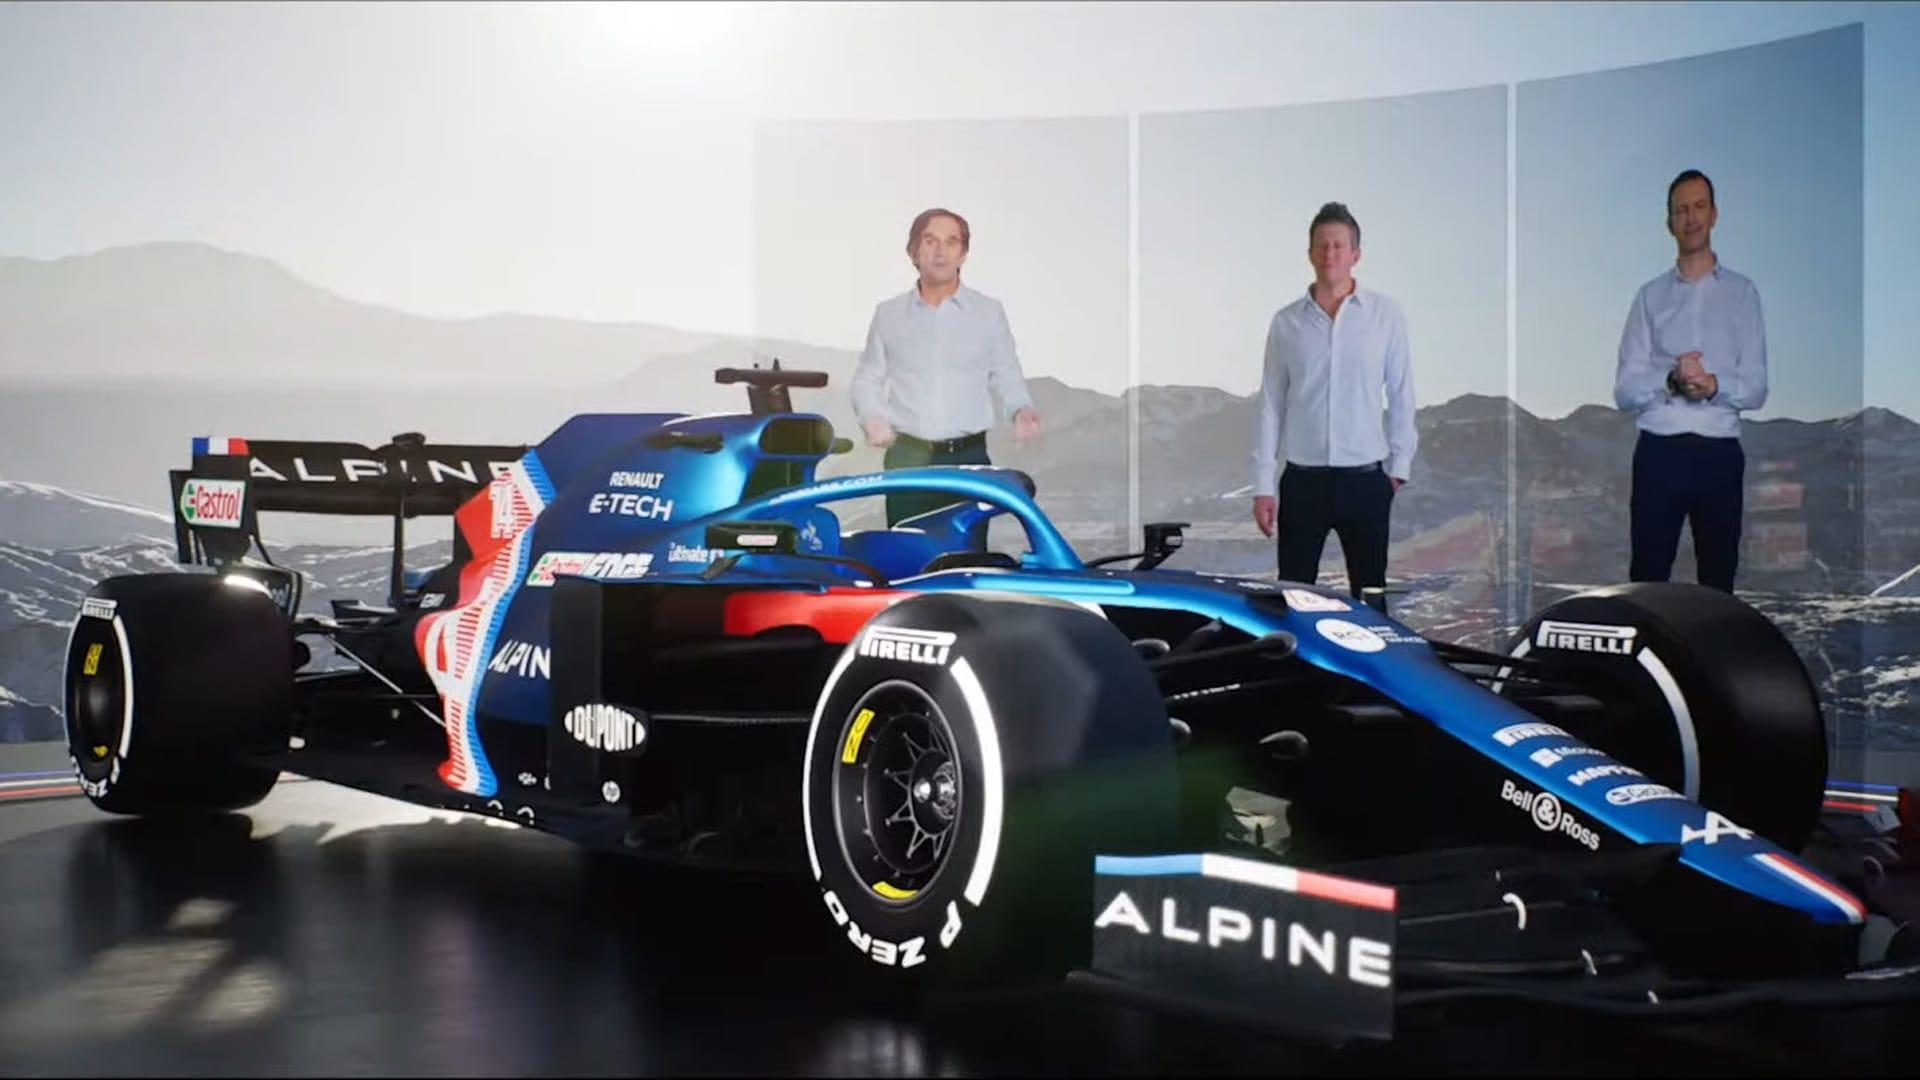 2021-Alpine-F1-Team-Launch-13-28-screenshot.jpg